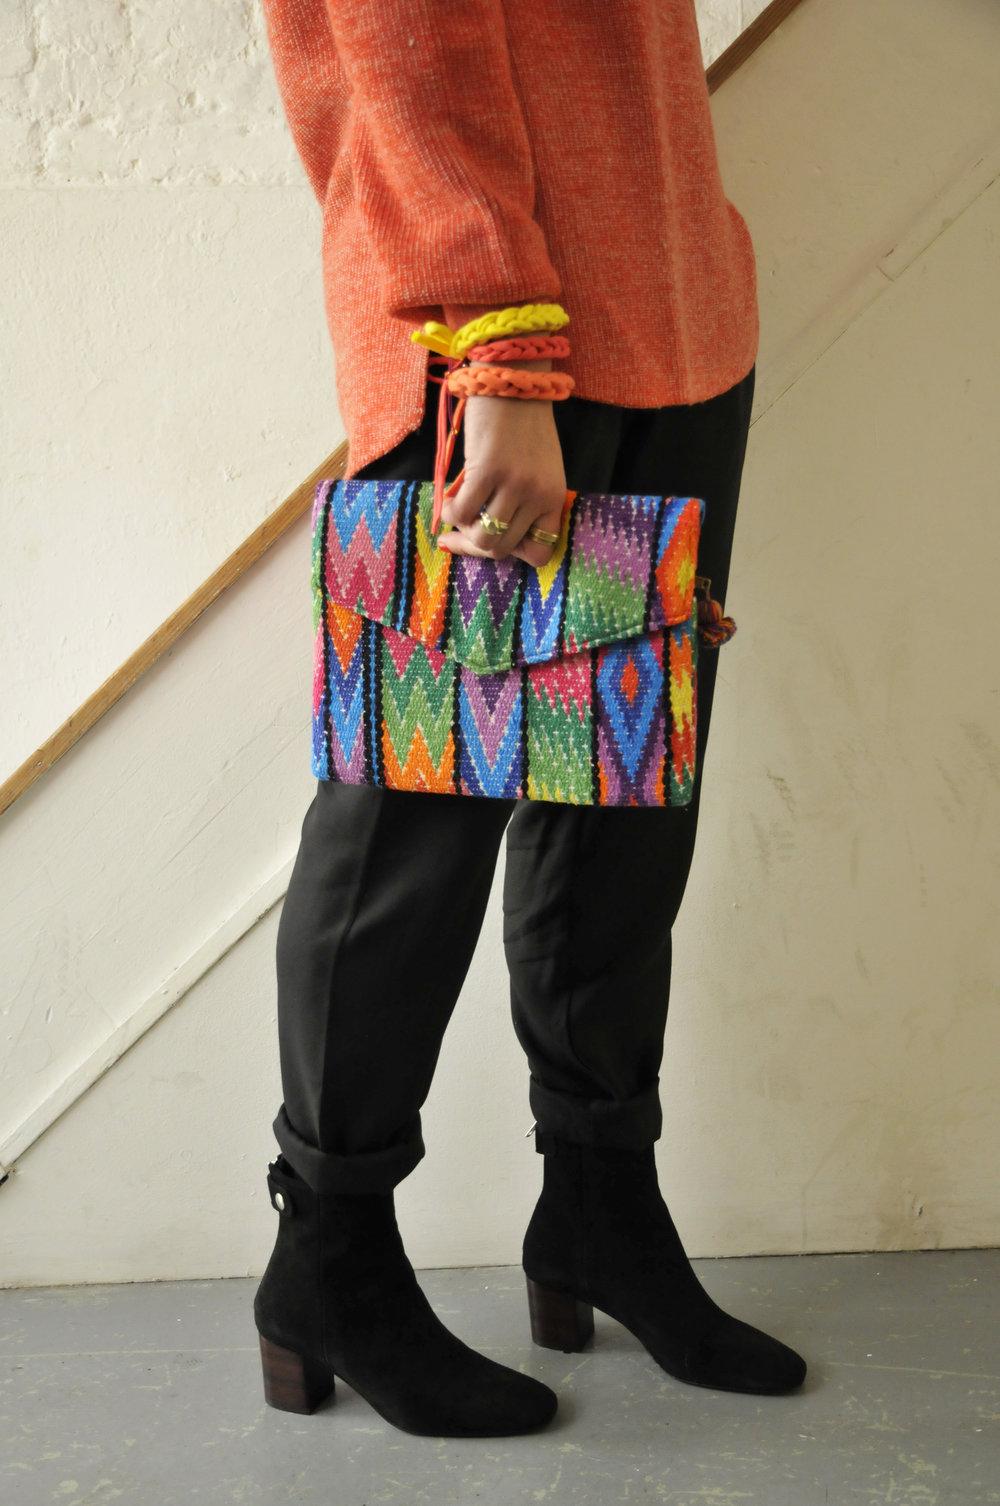 Knit Planet Jumper  Maske Trousers  Seven Boot Lane Boots  Golly Gumdrop Bracelets  Maya London Bag